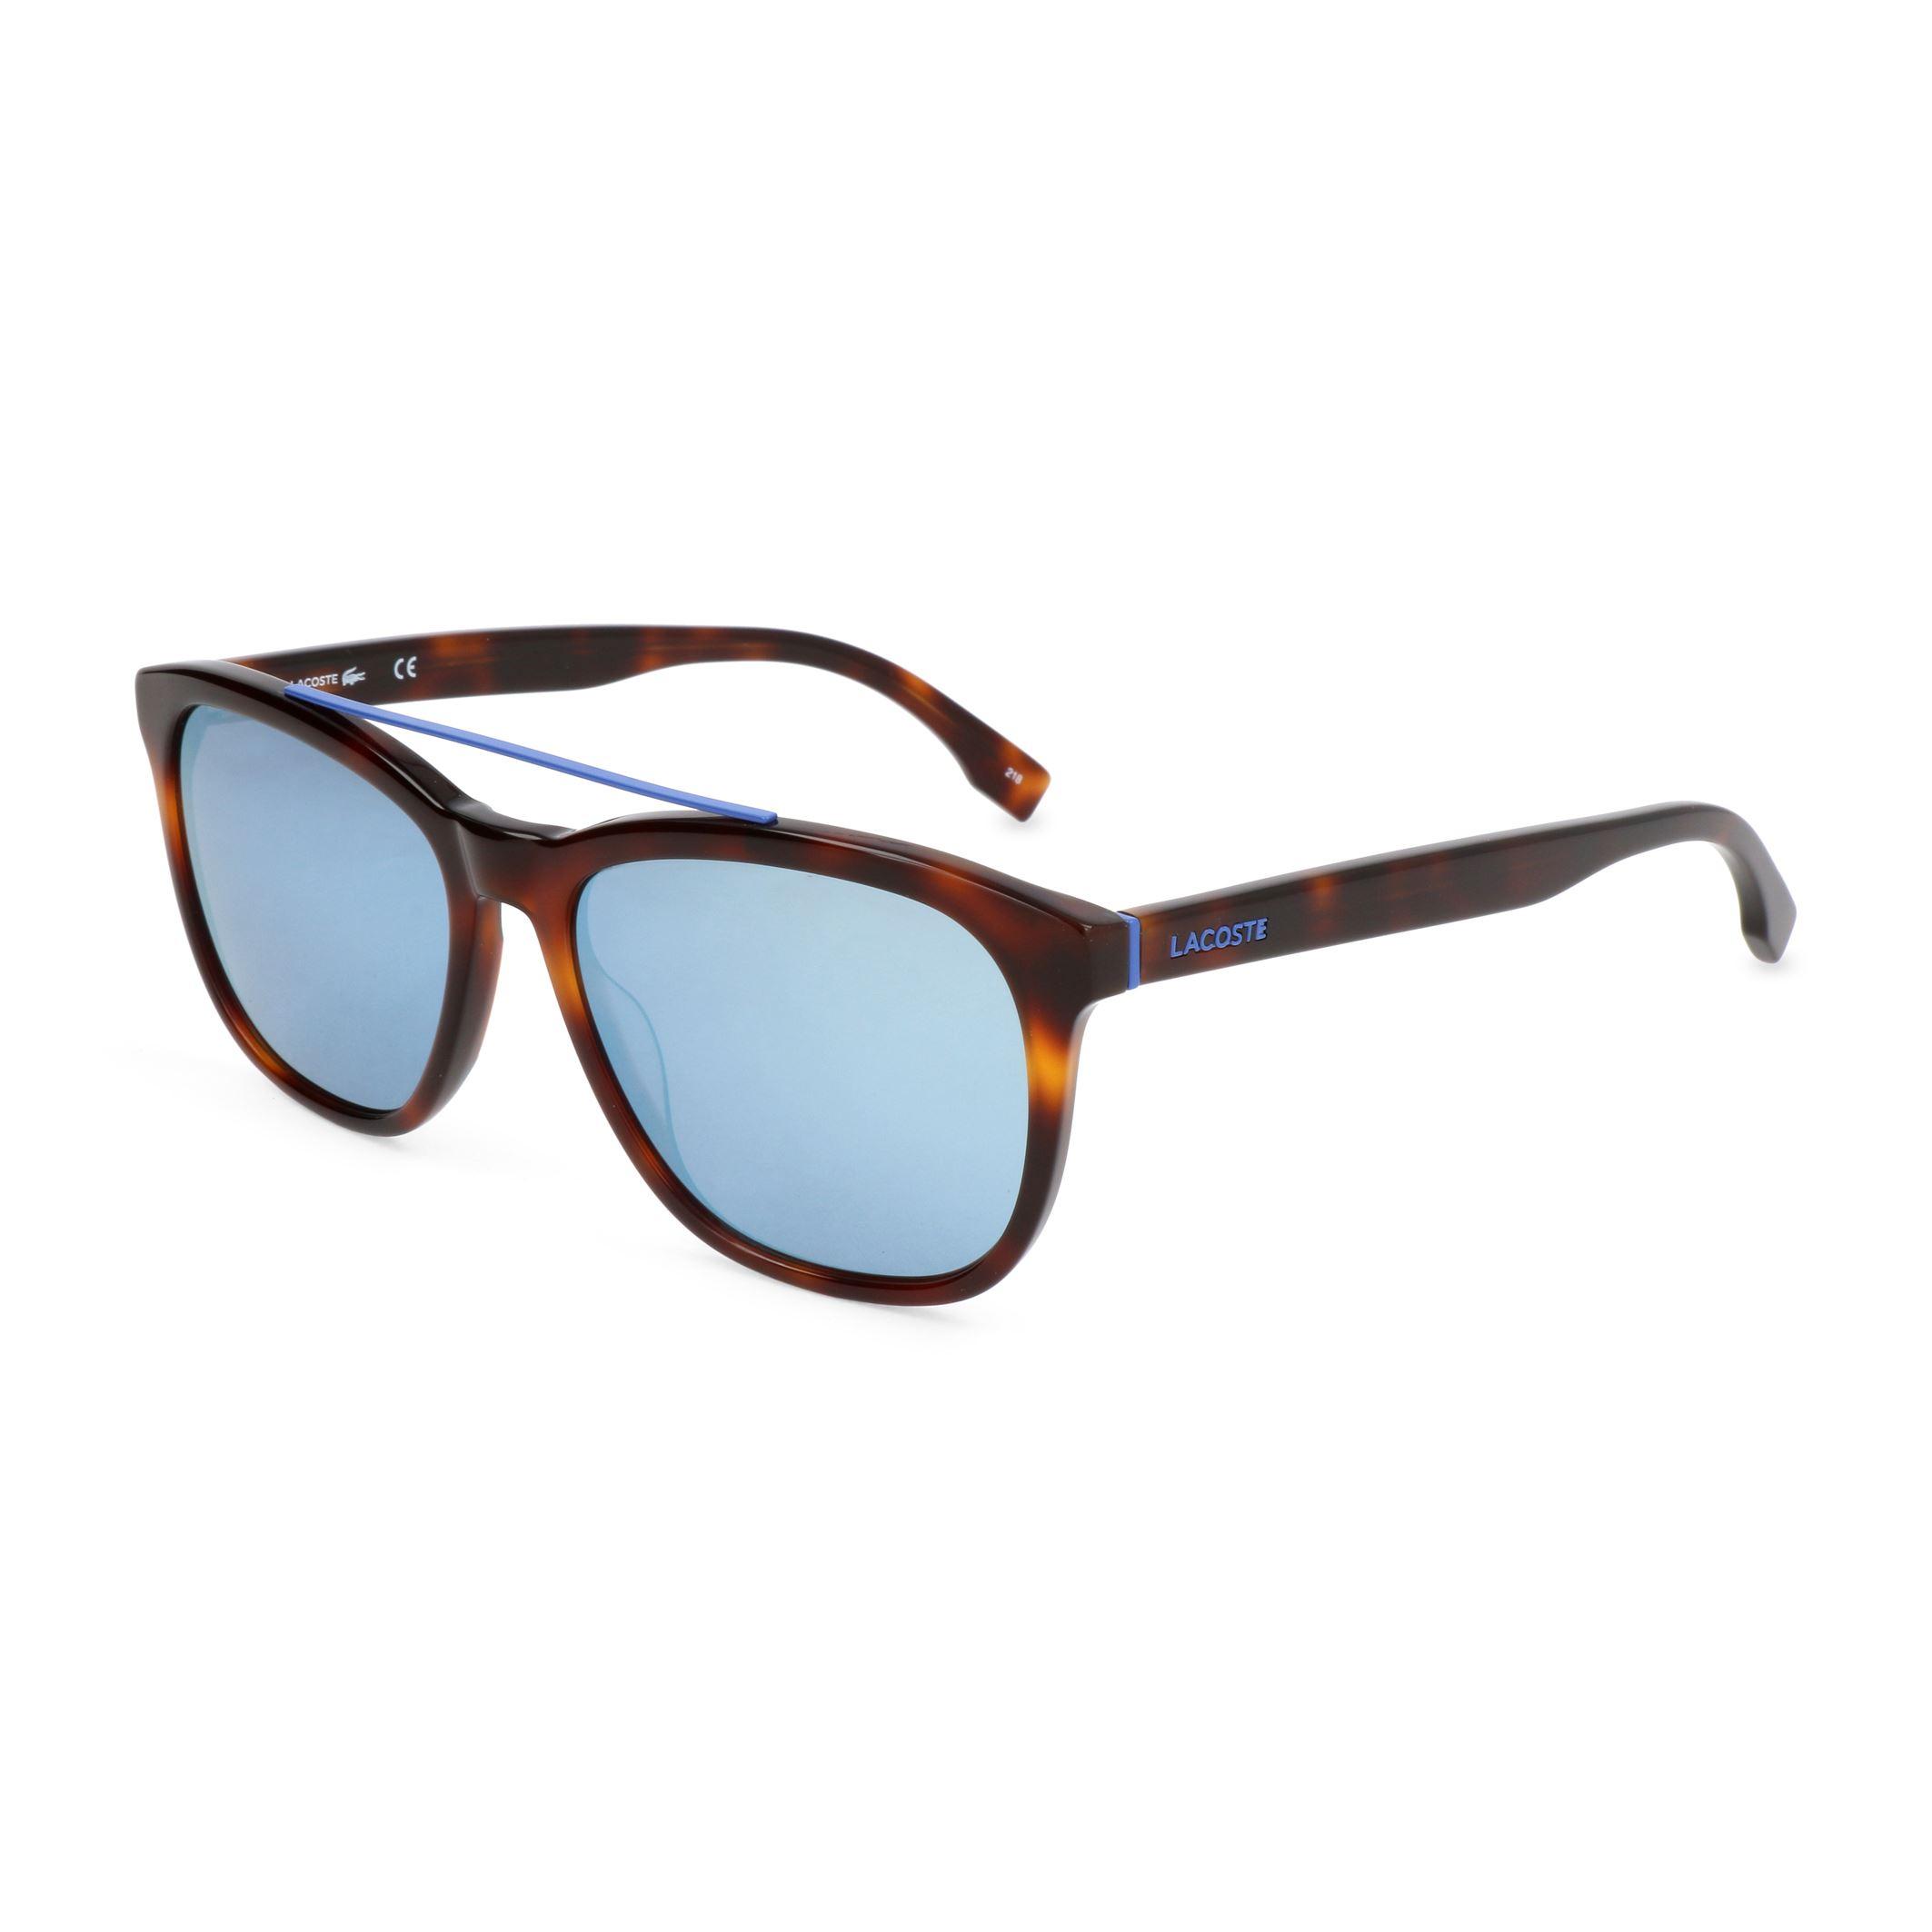 86c7b401dcf7 Details about Lacoste Men s Brown Sunnies Square Acetate Frame UV3  Sunglasses